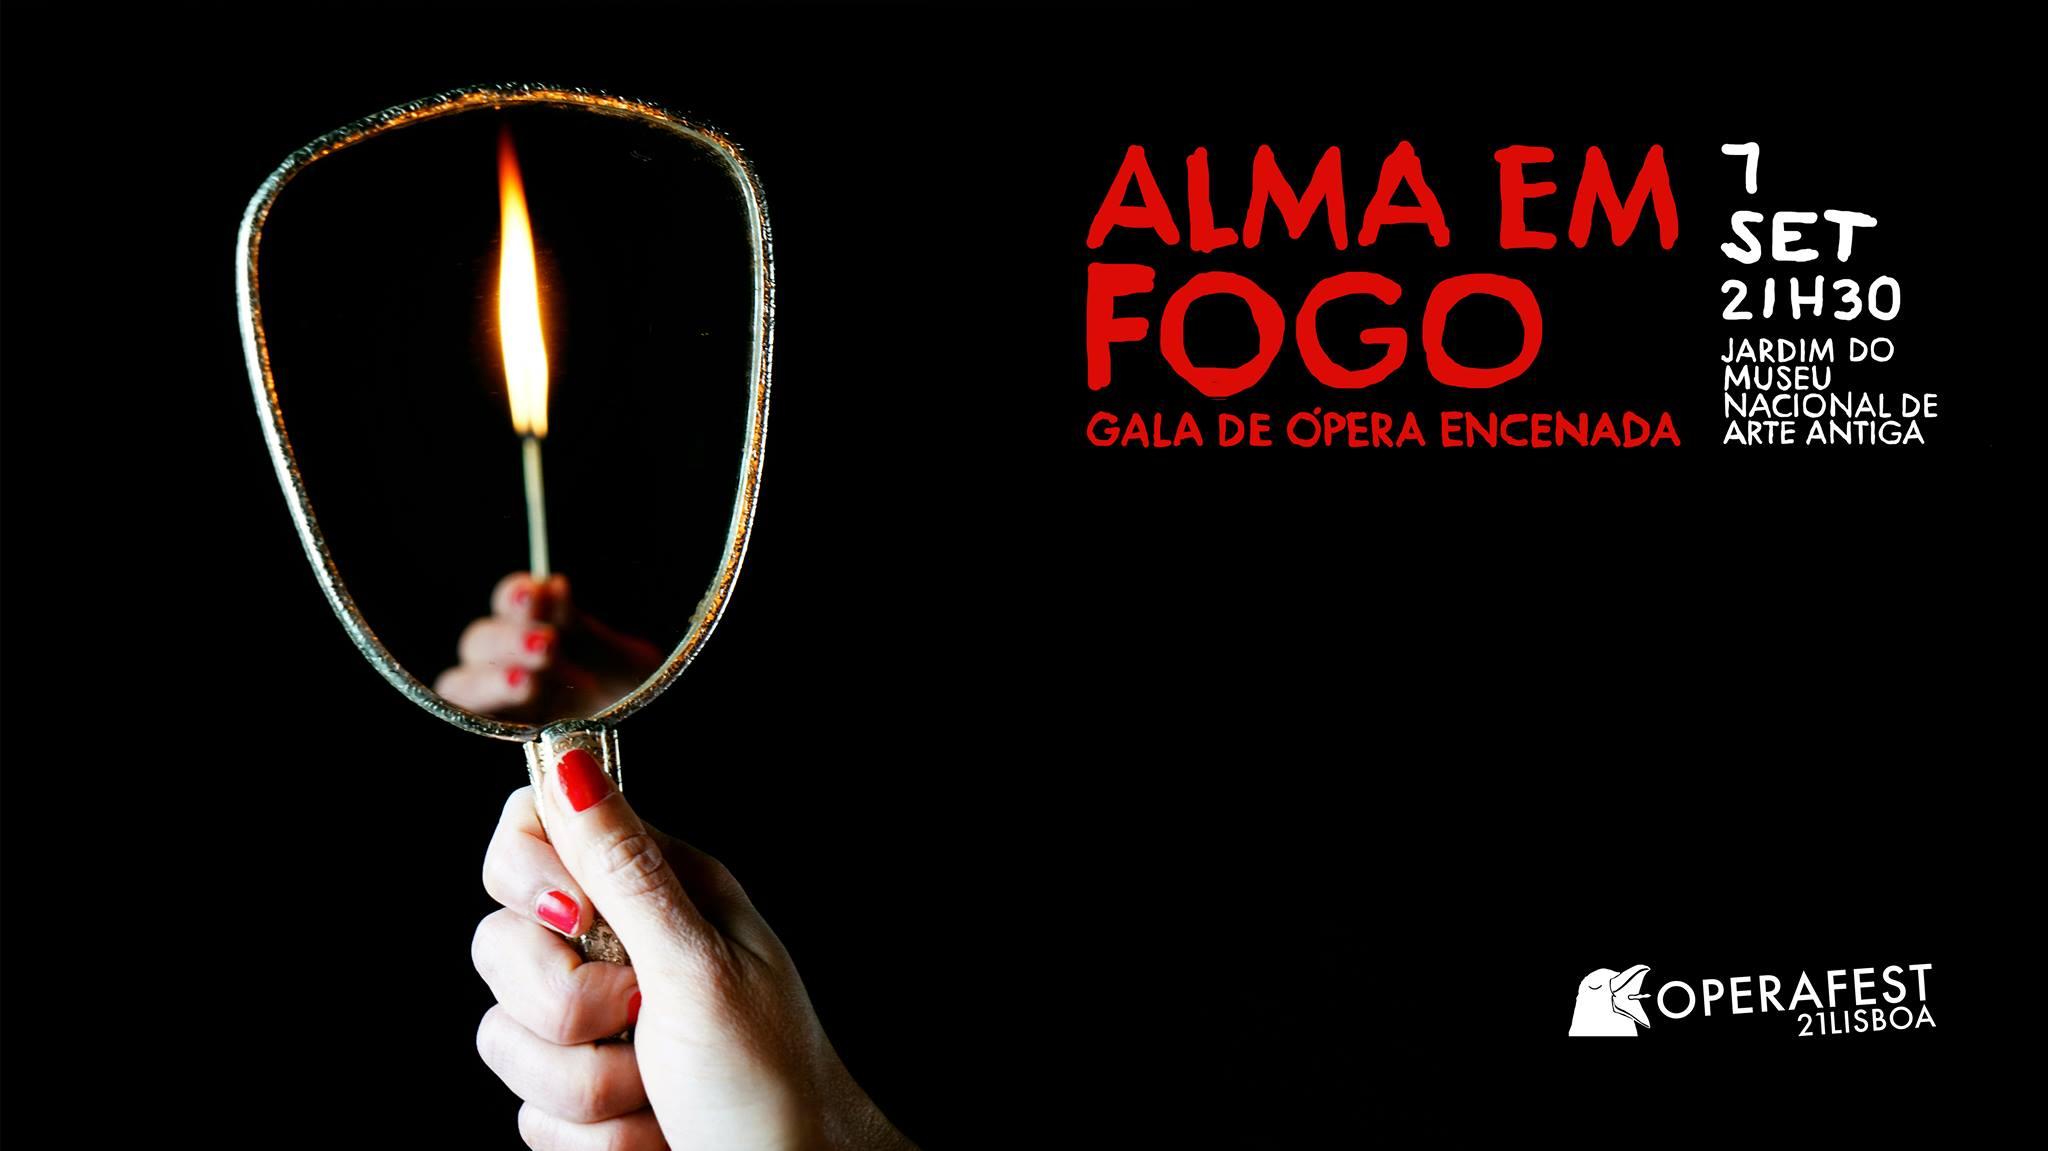 Gala de Ópera Encenada ALMA EM FOGO - OPERAFEST LISBOA 2021